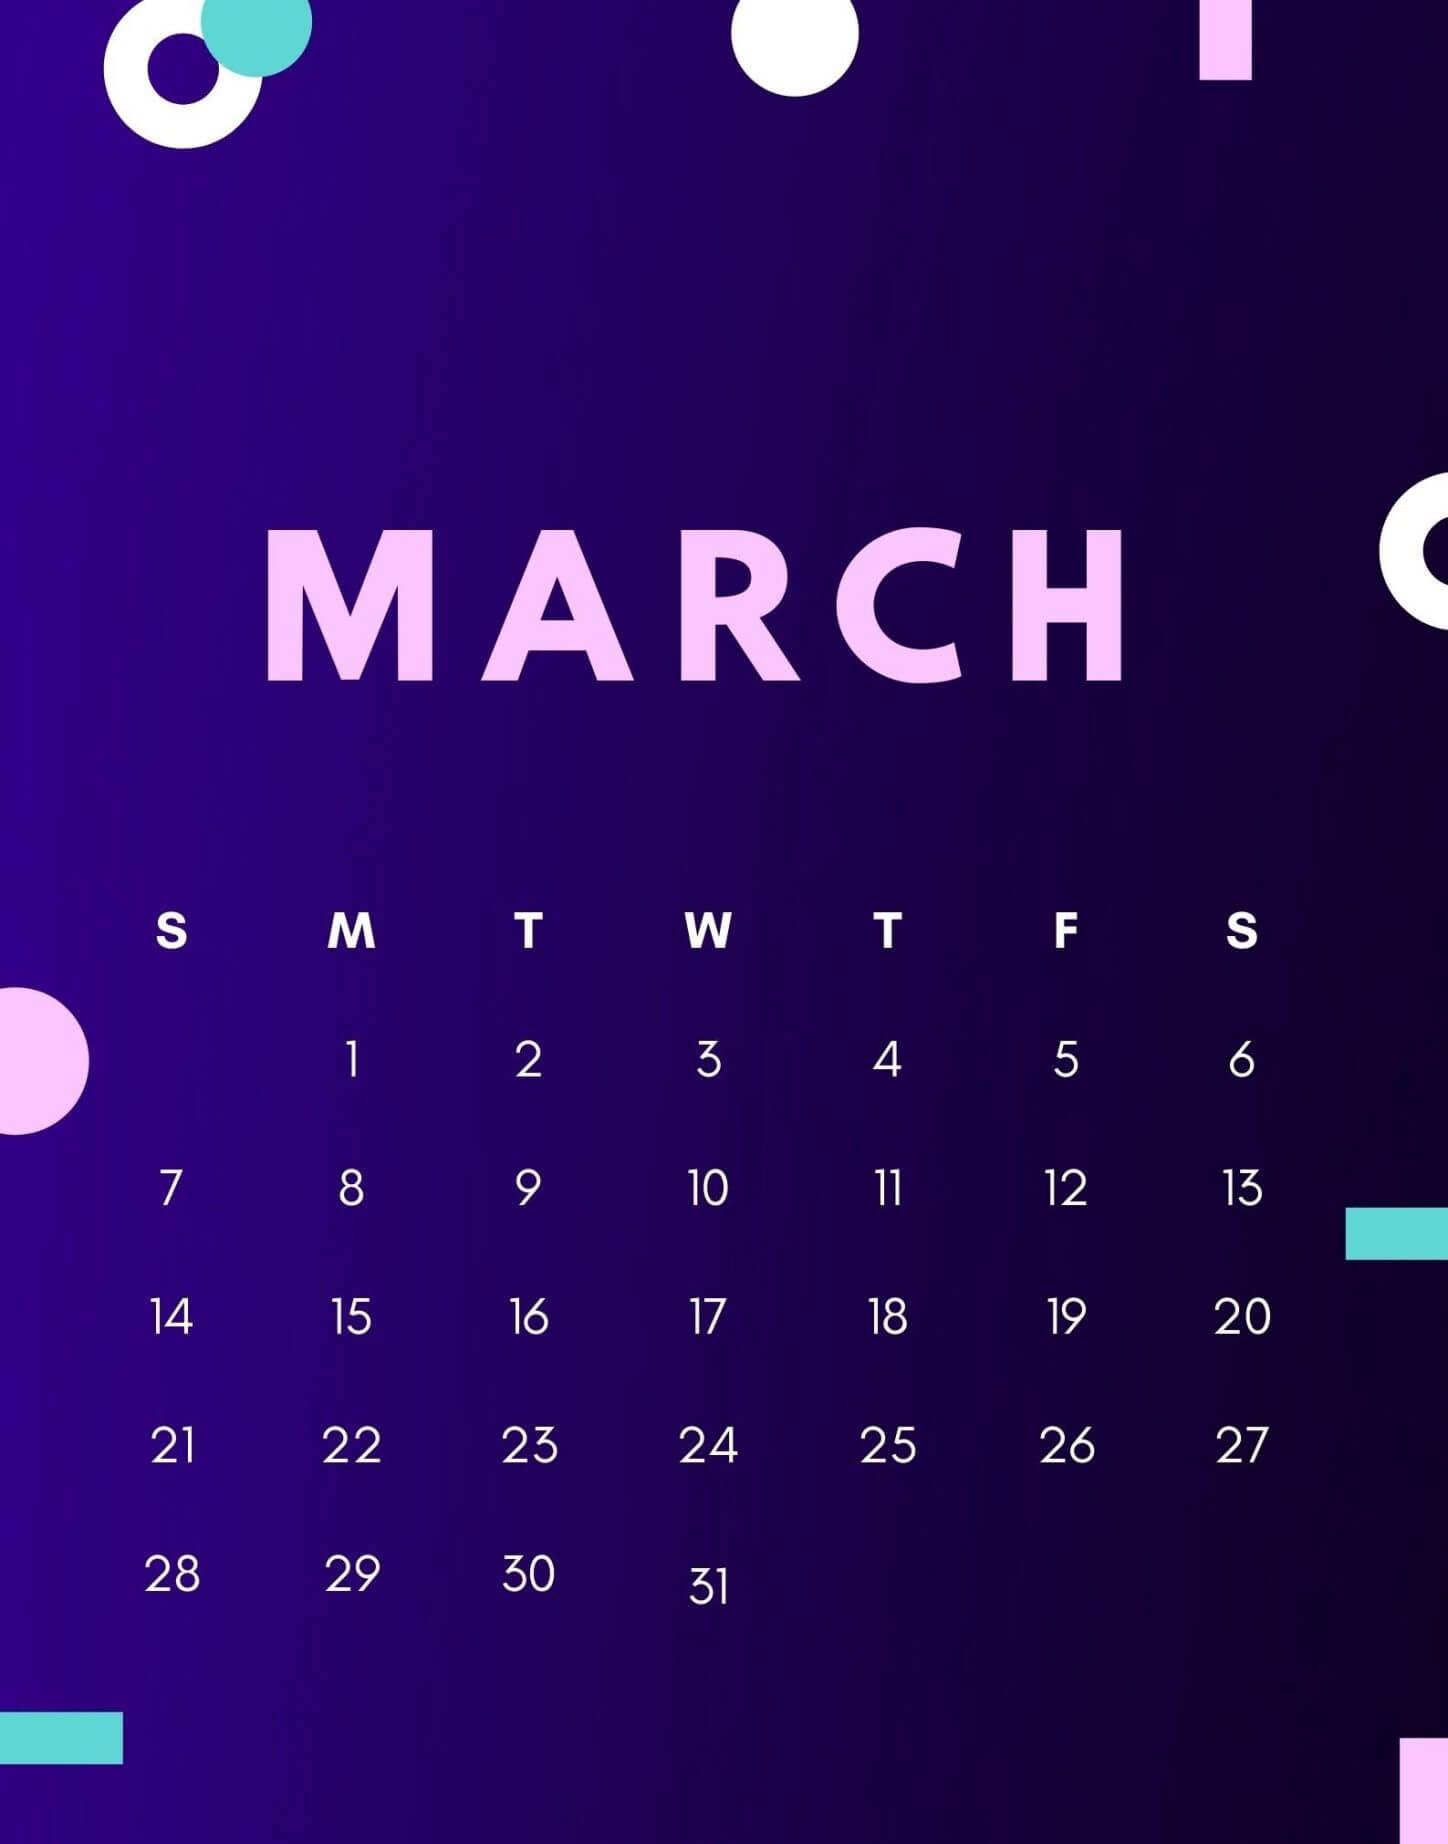 Cute March 2021 Wall Calendar